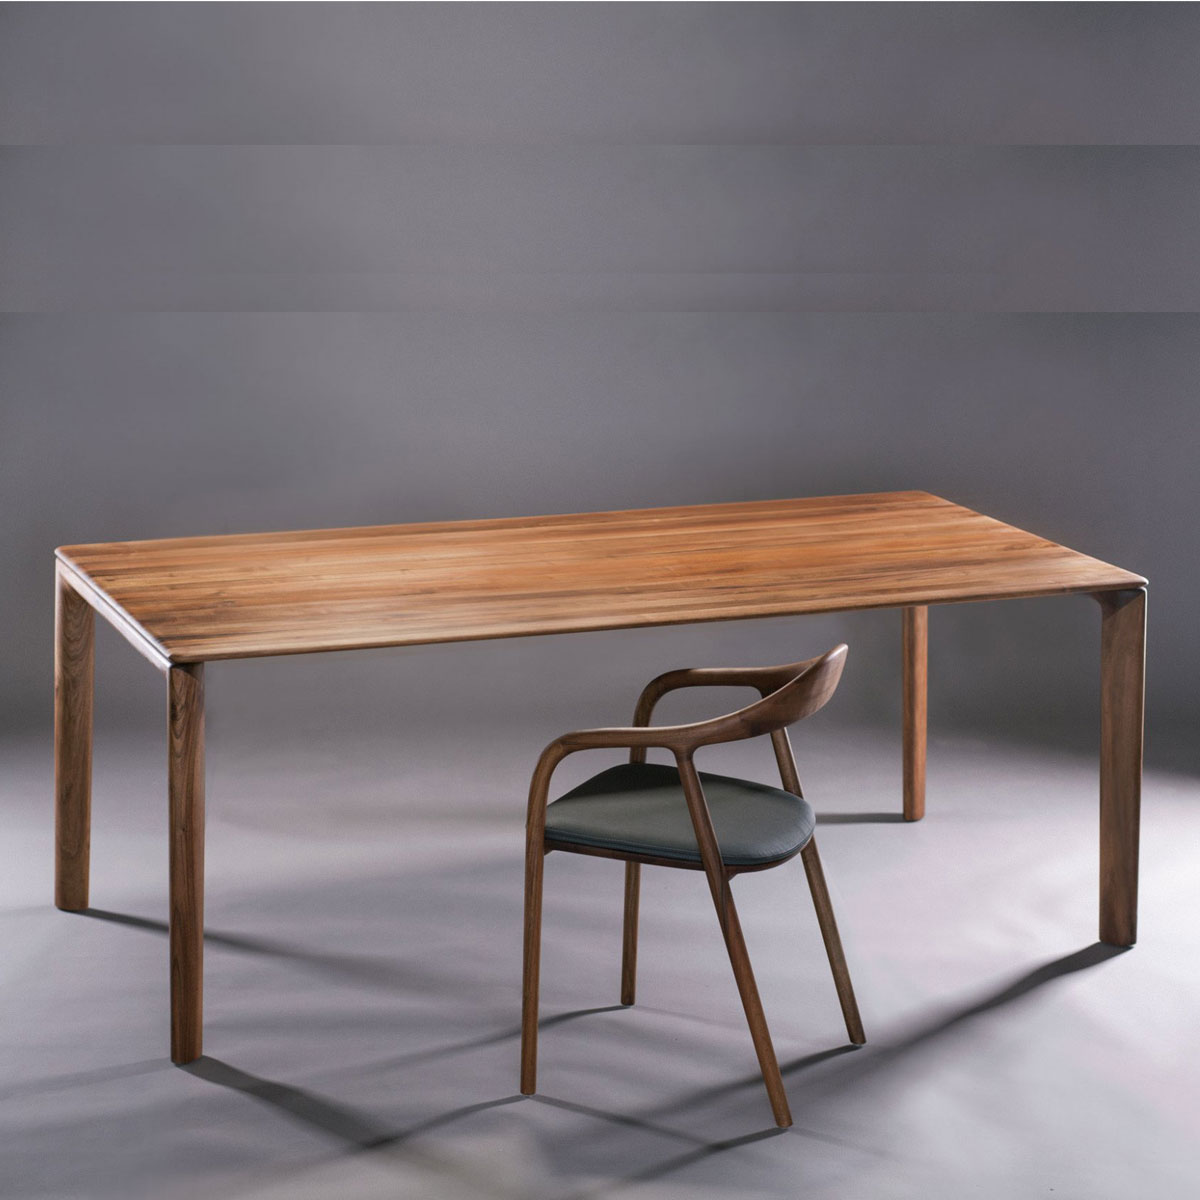 Mesa Neva, diseño vanguardista en madera de producción artesana